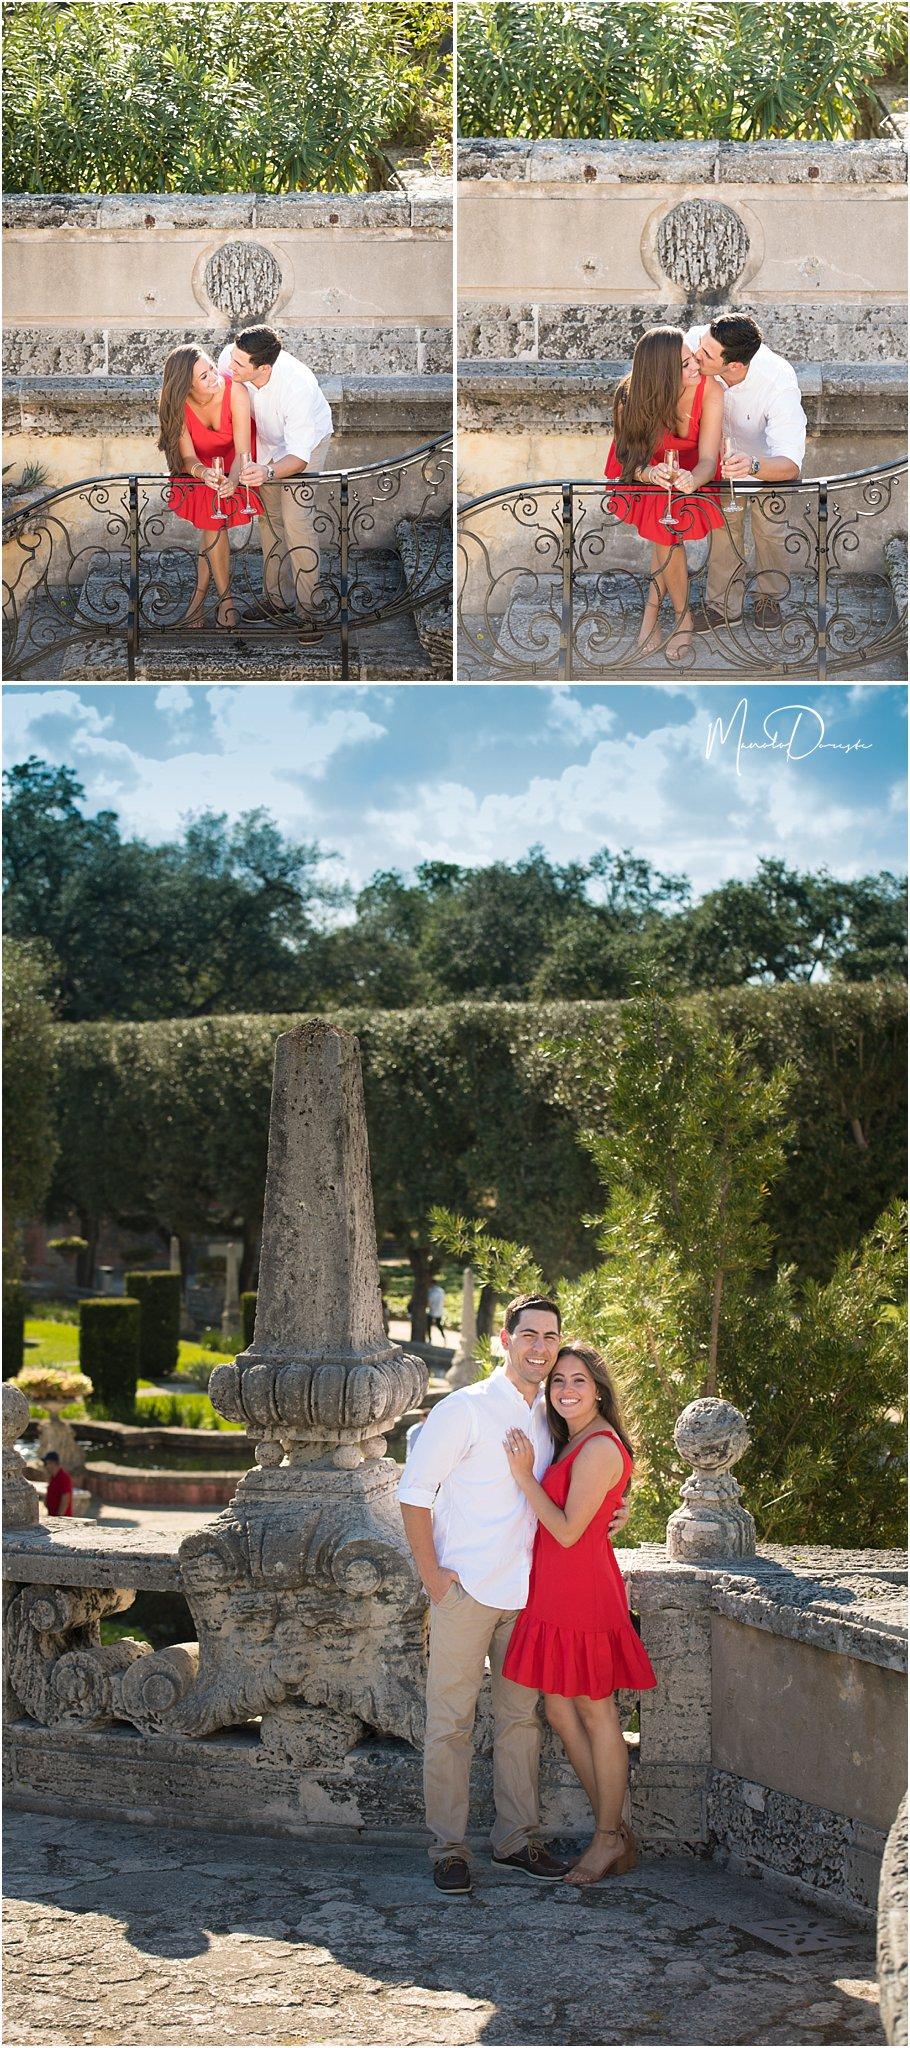 00868_ManoloDoreste_InFocusStudios_Wedding_Family_Photography_Miami_MiamiPhotographer.jpg